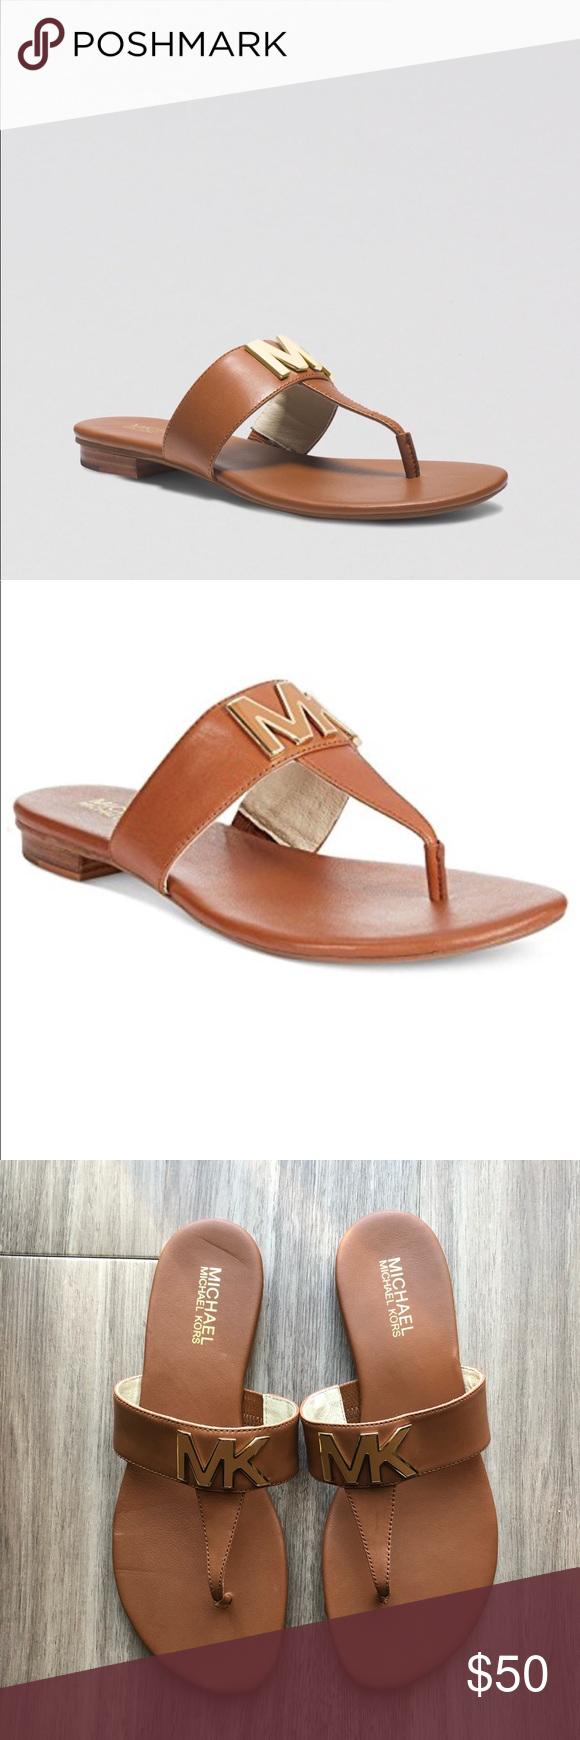 0257d45e2820 Michael Michael Kira Hayley Leather Thong Sandals Michael Michael Kors  Hayley leather thong flat sandals. Mandarin